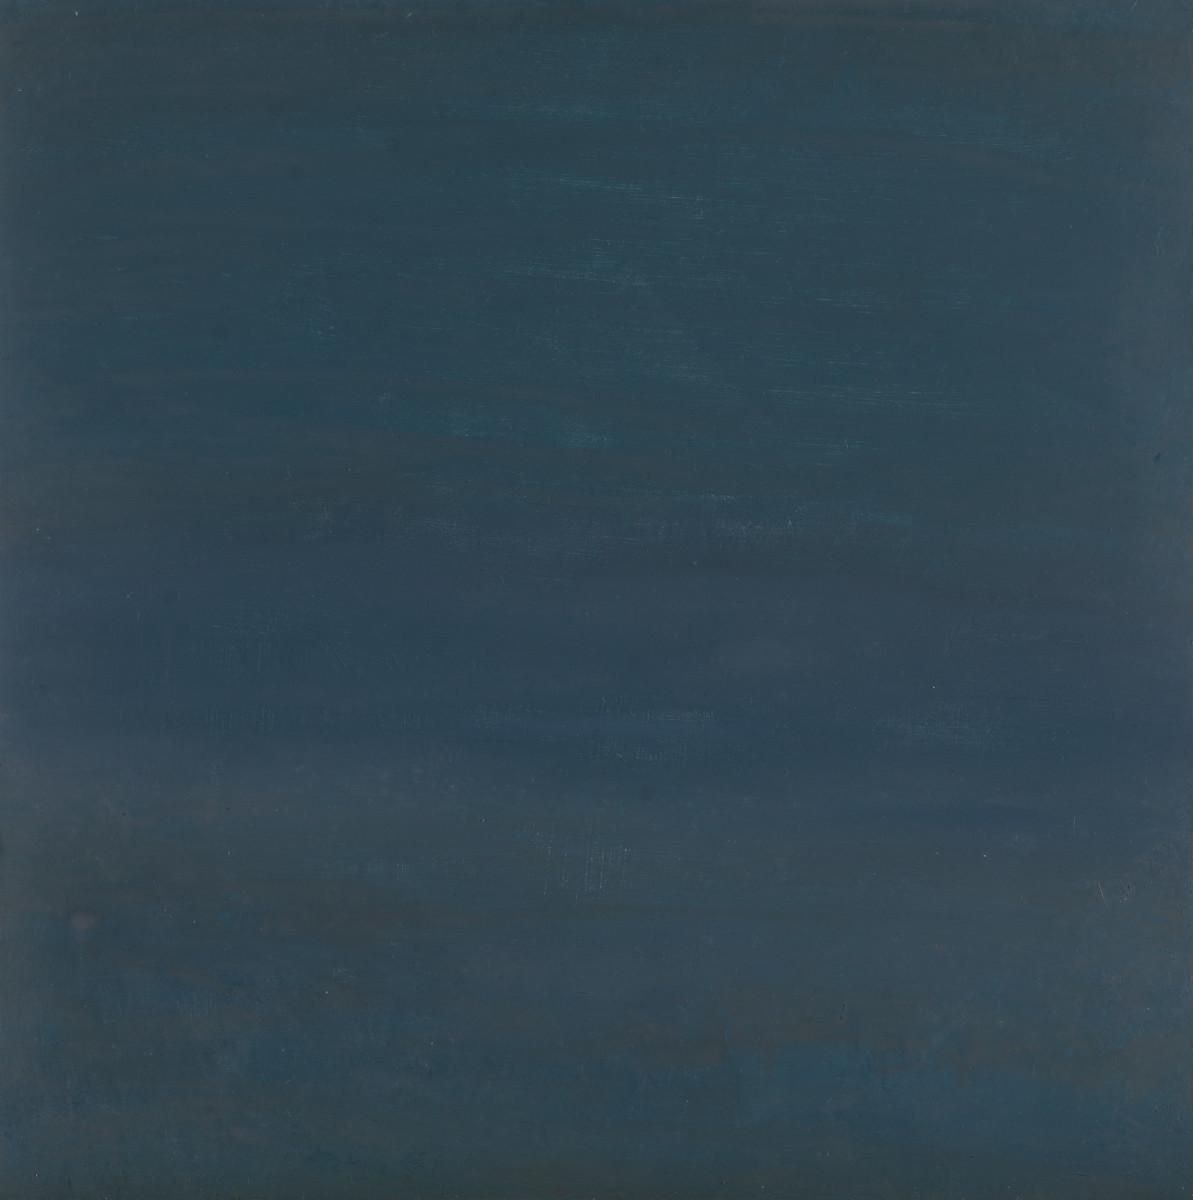 Study 19 (Waves) by Claudia de Grandi